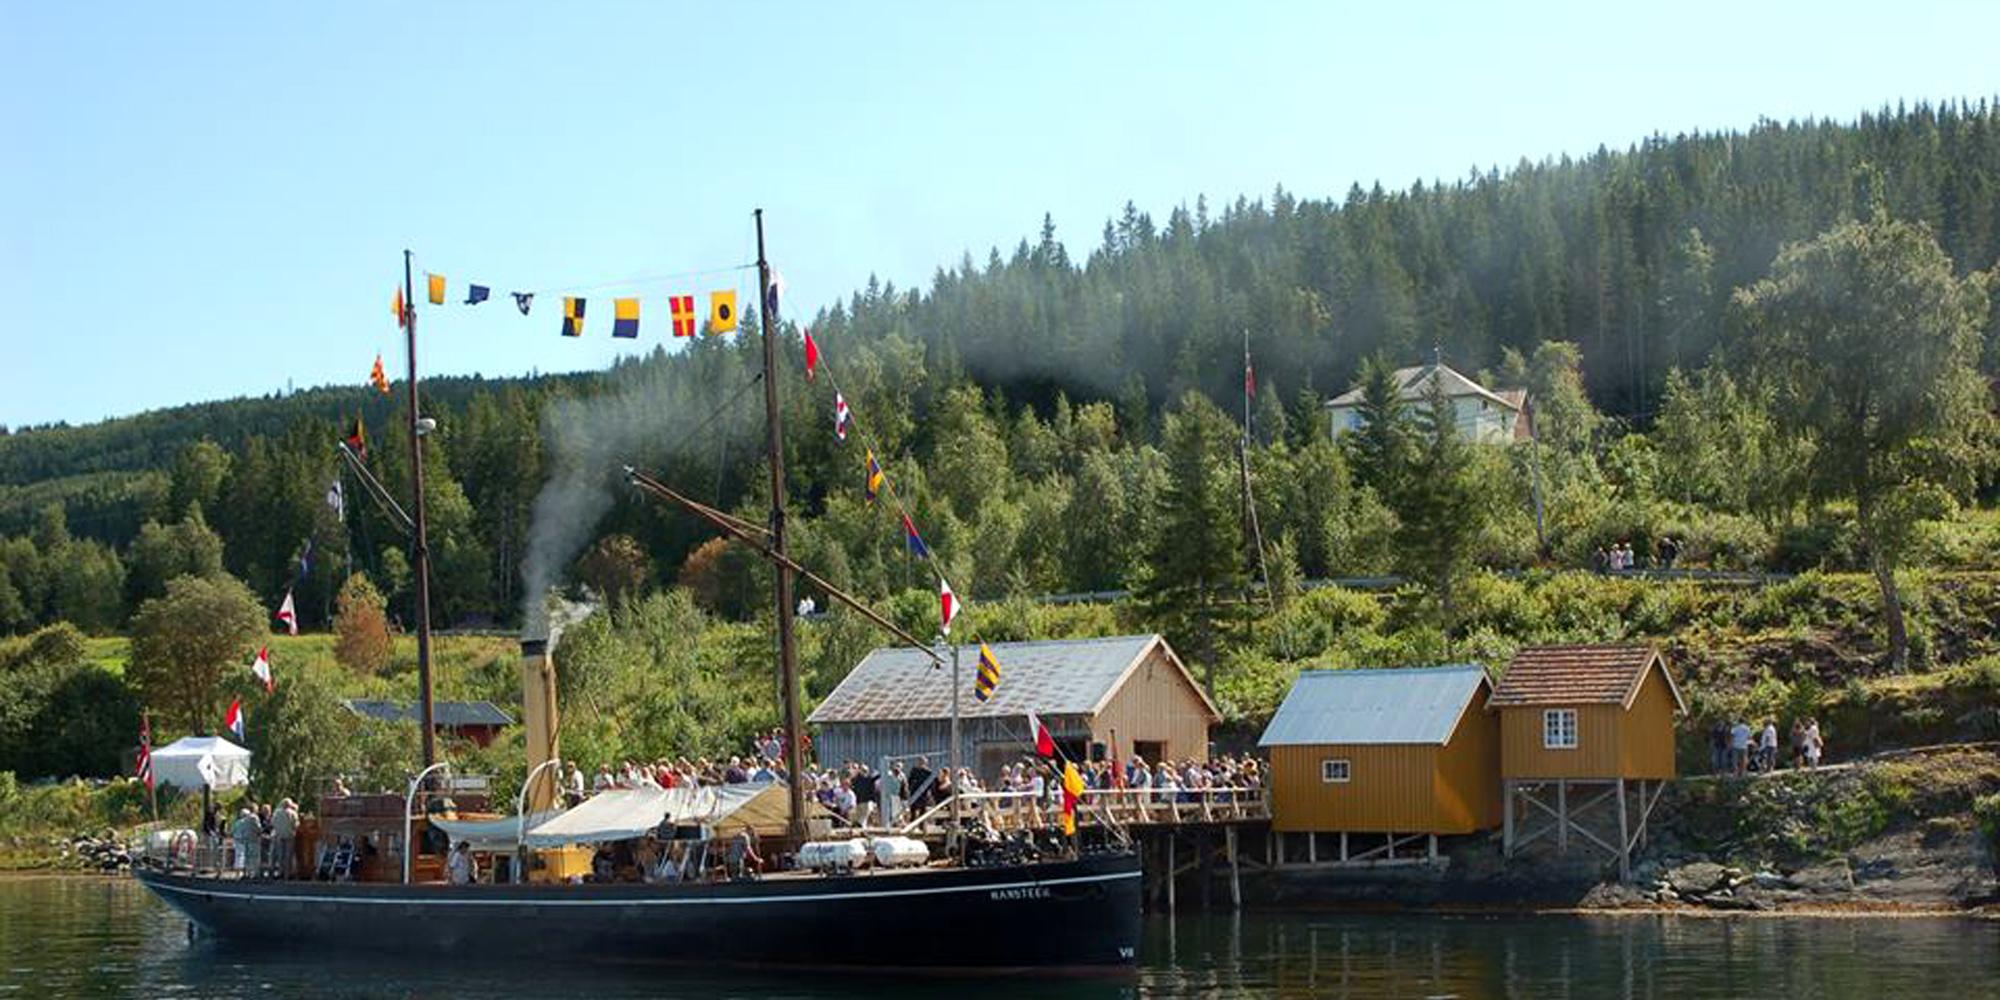 SDS Hansteen ved Jørstadsjøen dampskibskai - Ytterøy. Copyright: En Eventyrlig Seilas